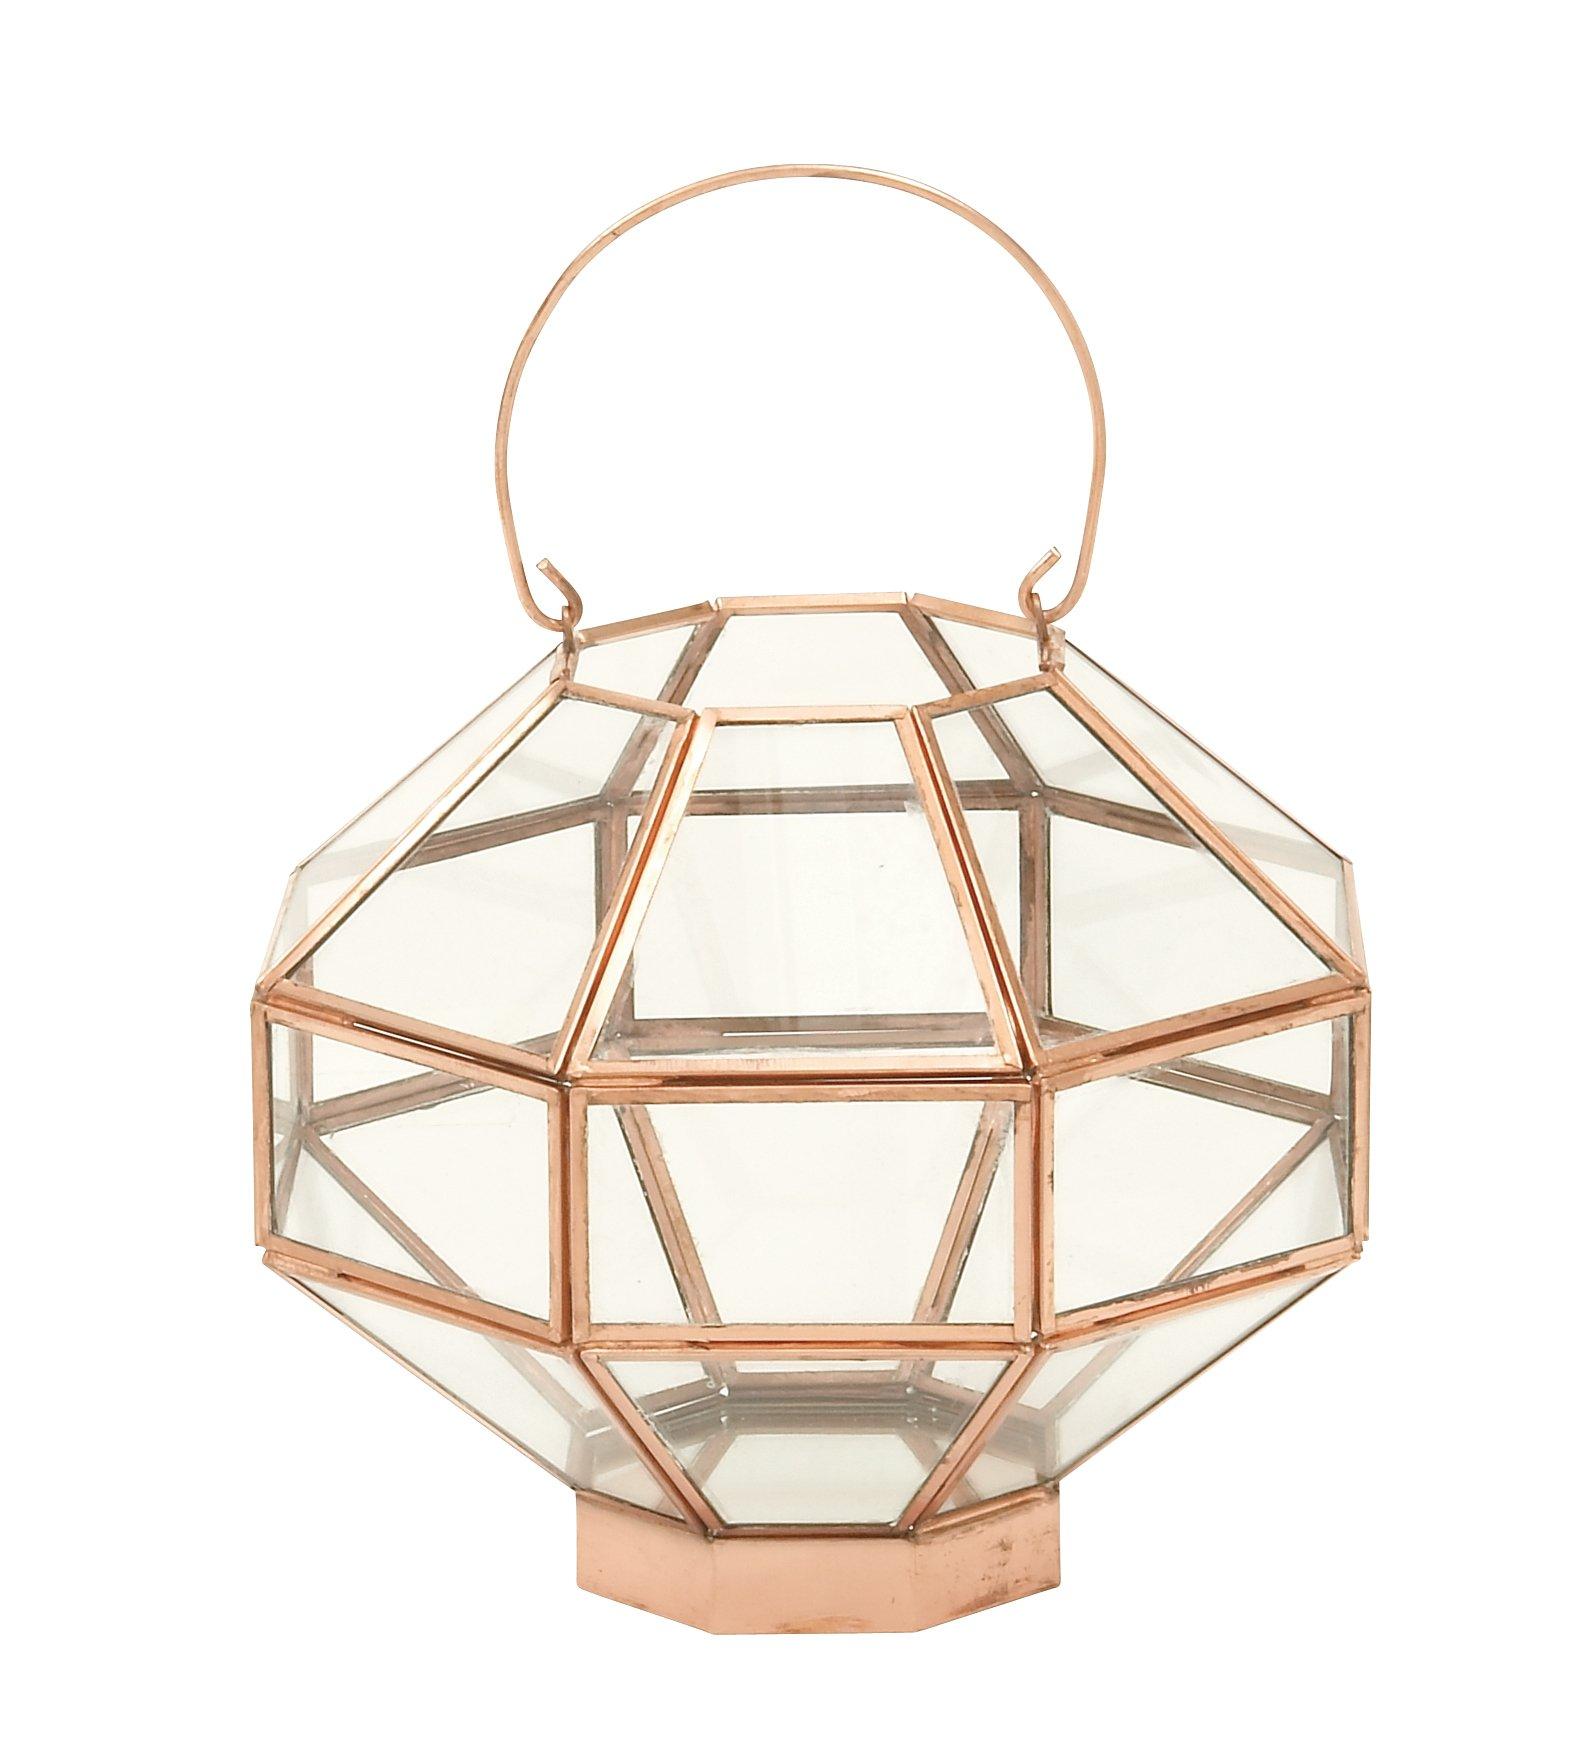 Metal Glass Mirror Cpr Lantern 9''W, 12''H - 37156 by Deco 79 (Image #2)